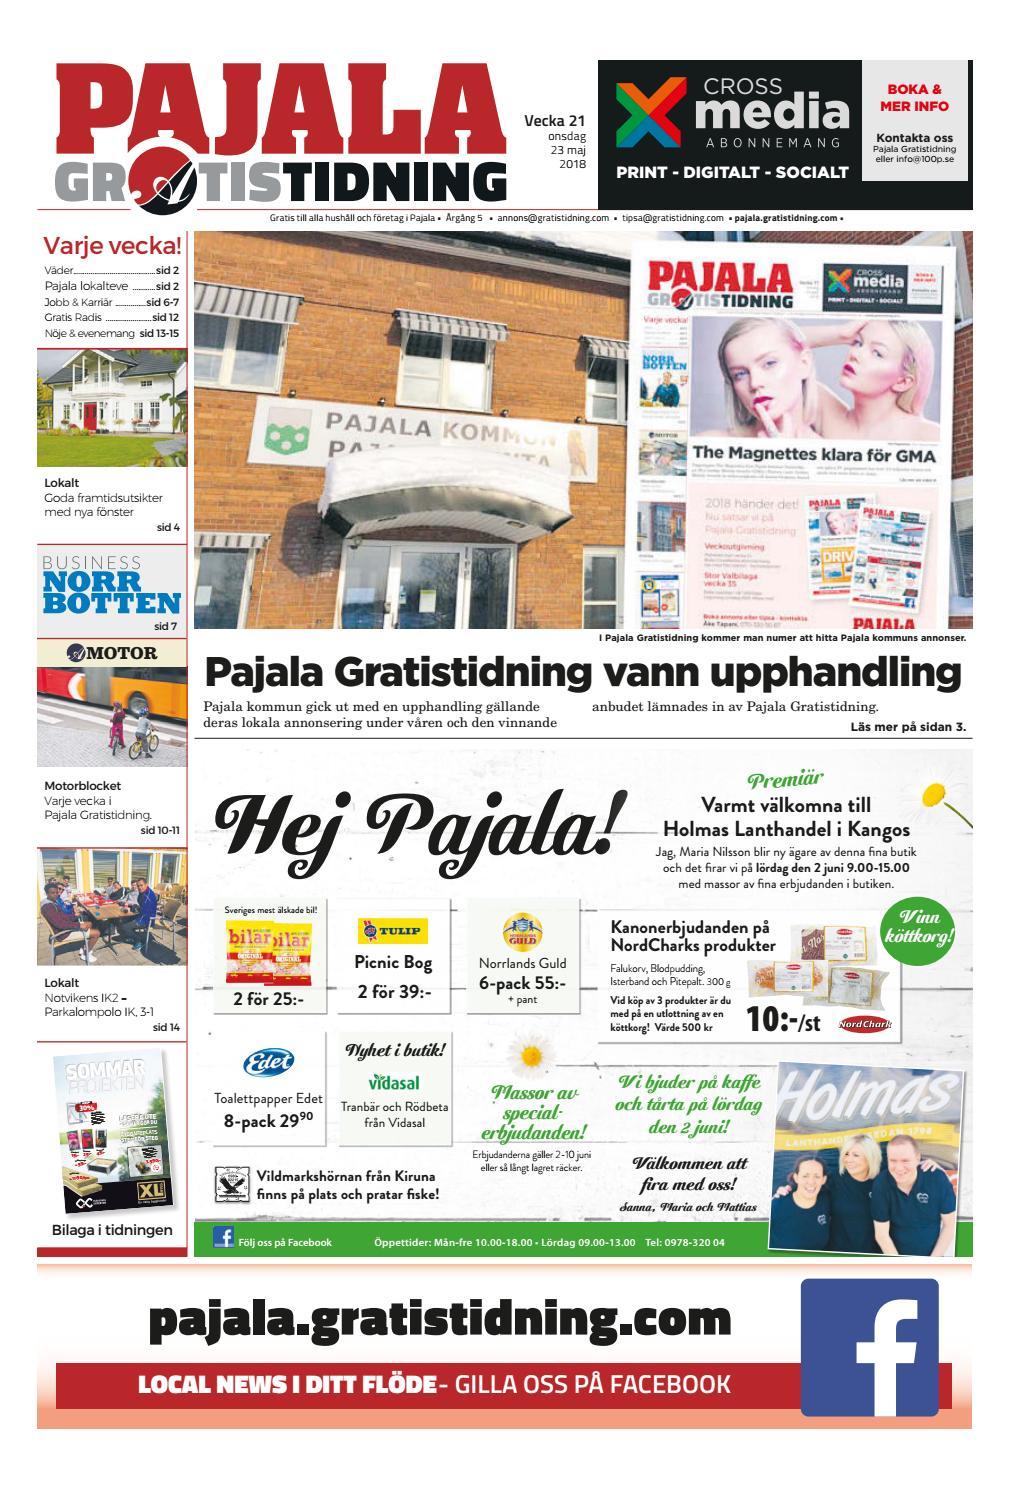 ppen verksamhet i Lule | patient-survey.net